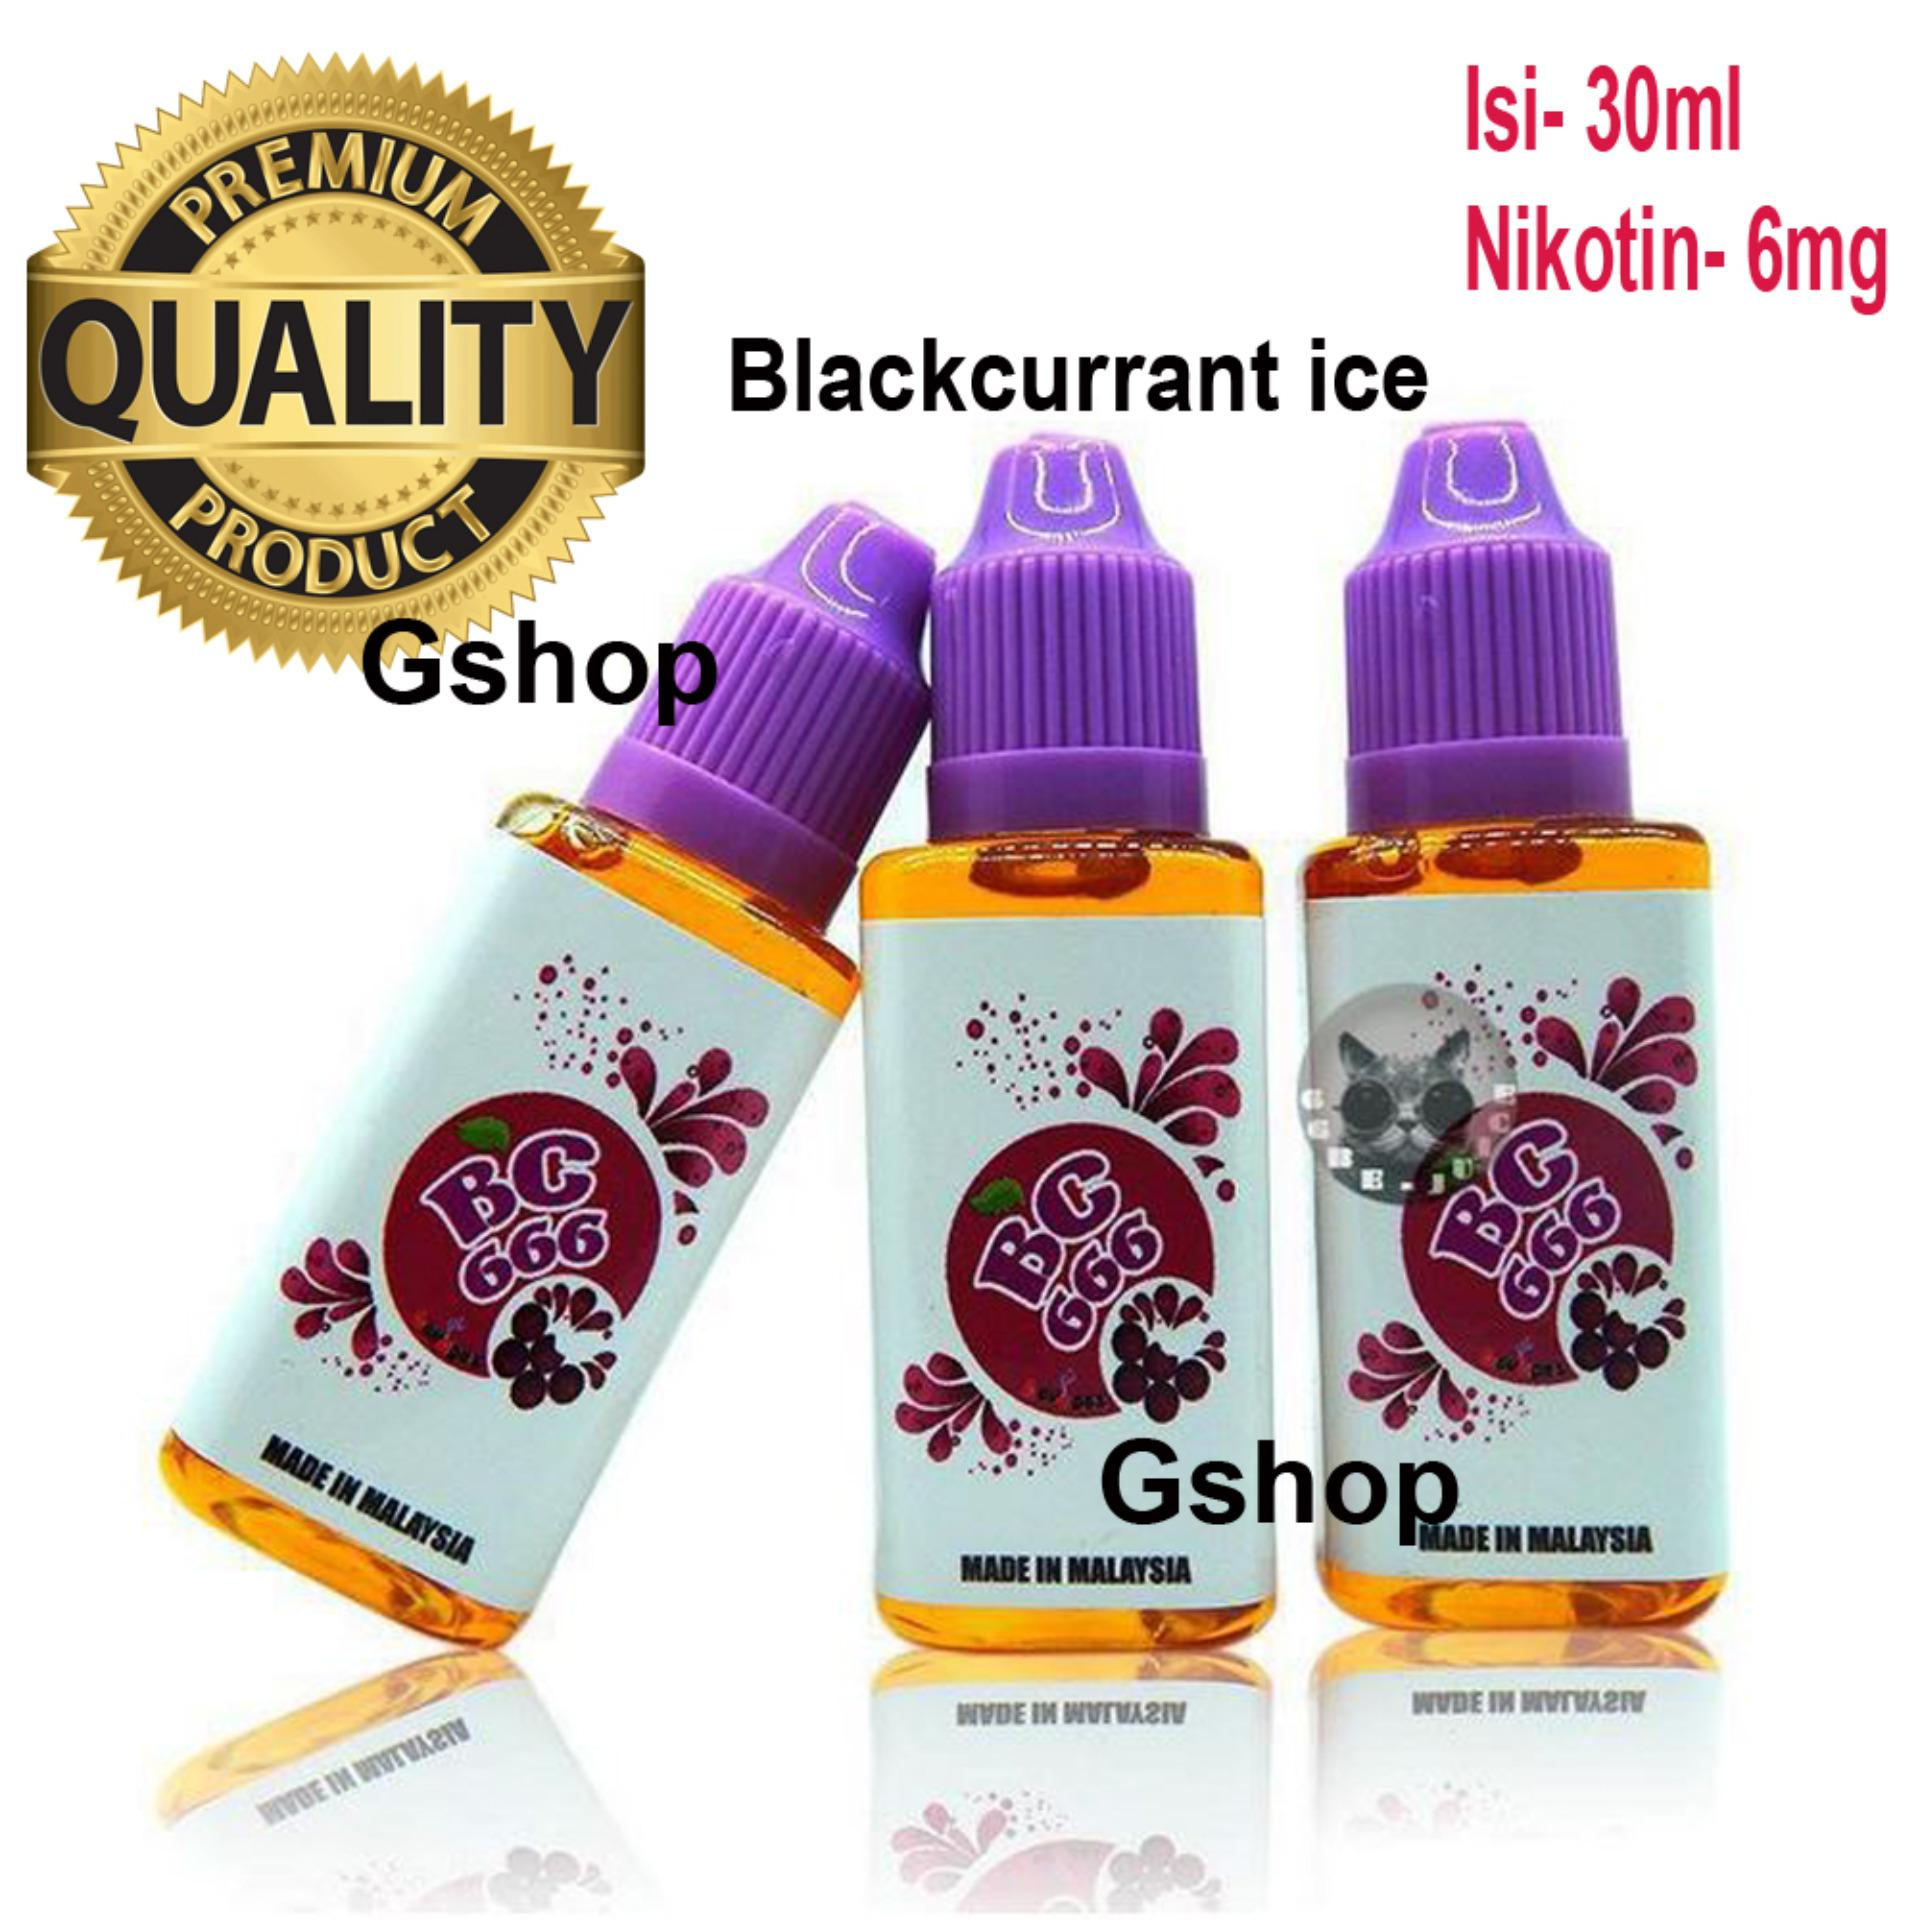 Gshop Premium E-Liquids 30ml (BV 666) 6mg Nicotine for ElectronicCigarettes